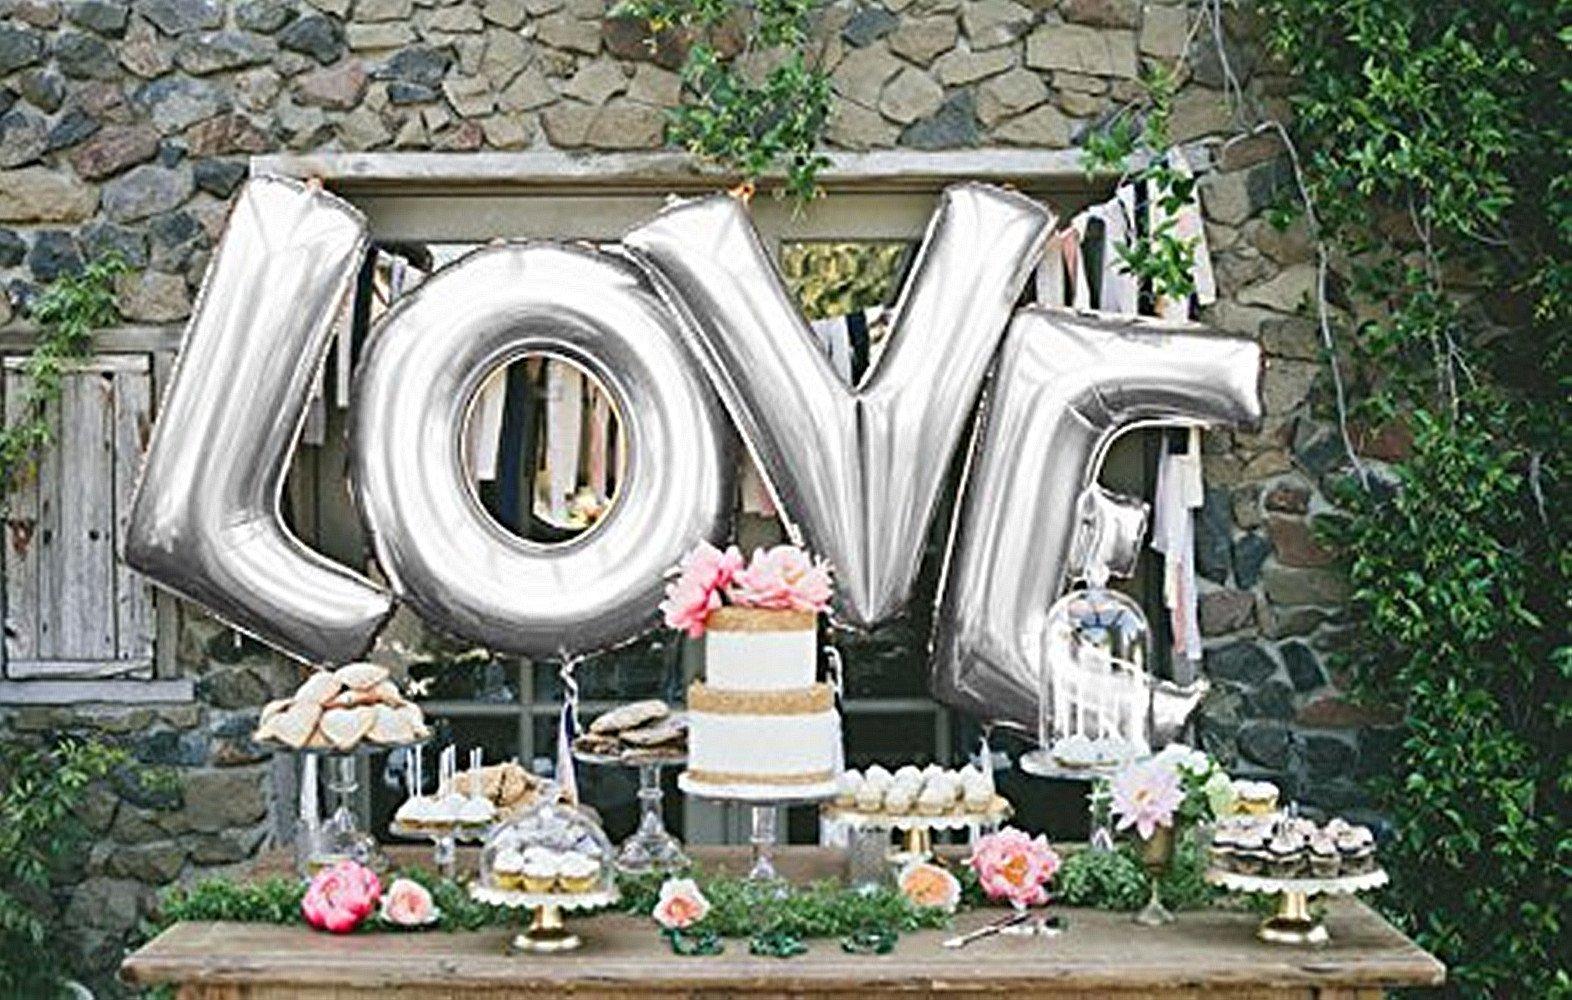 B-G 40'' LOVE Balloon Set Bridal Shower Party Birthday Vow Renewal Wedding Decoration (Sliver)